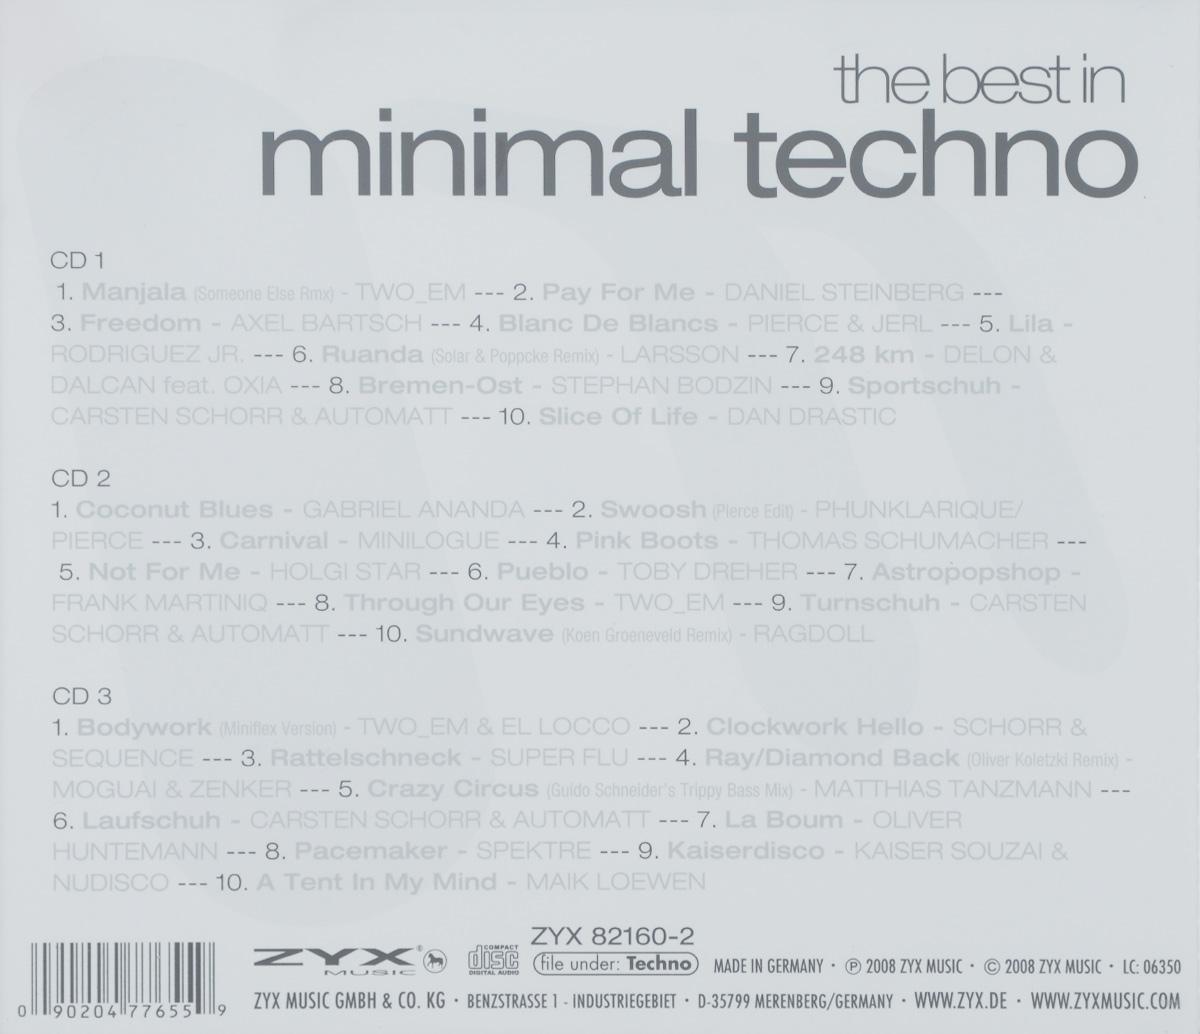 "The Best In Minimal Techno (3 CD). ""Two_Em"",Daniel Steinberg,Axel Bartsch,Pierce,Jerl,Rodriguez Jr.,Larsson,Oxia,Dalcan,Delon,Стефан Бодзин,Automatt,Габриэль Ананда,""Minilogue"",Томас Шумахер,Тоби Дреер,Франк Мартиник,Carsten Schorr,""Ragdoll"",Punklarique,""Super Flu"",Moguai,Zenker,Маттиас Танцманн,Оливер Хантмэнн,""Nudisco"",Kaiser Souzai,Майк Ловен"